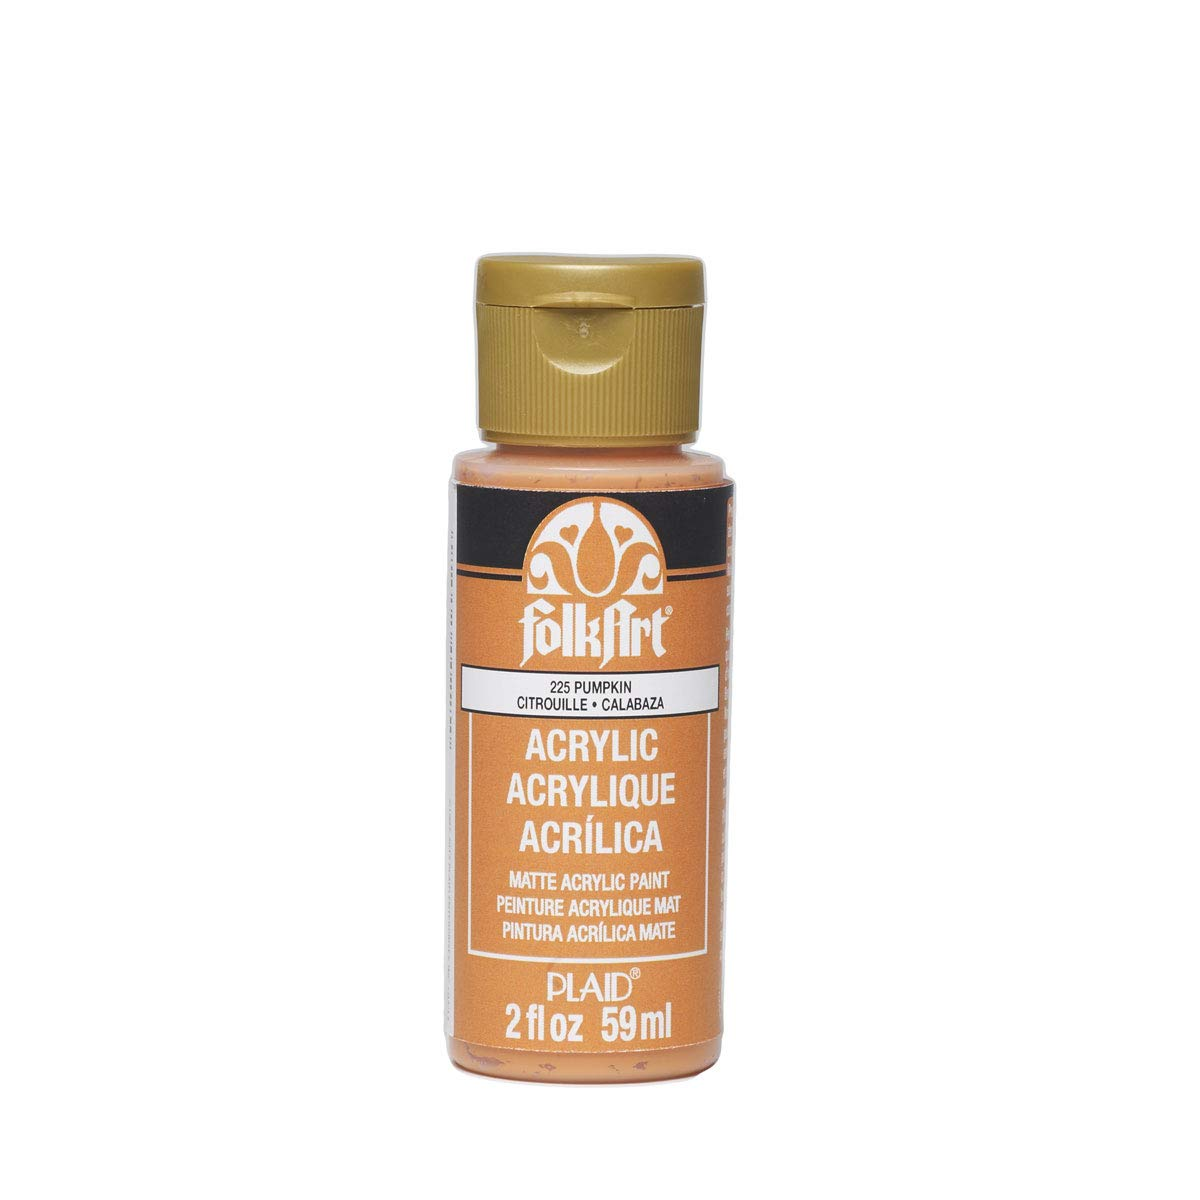 FolkArt Acrylic Paint in Assorted Colors (2 oz), 225, Pumpkin